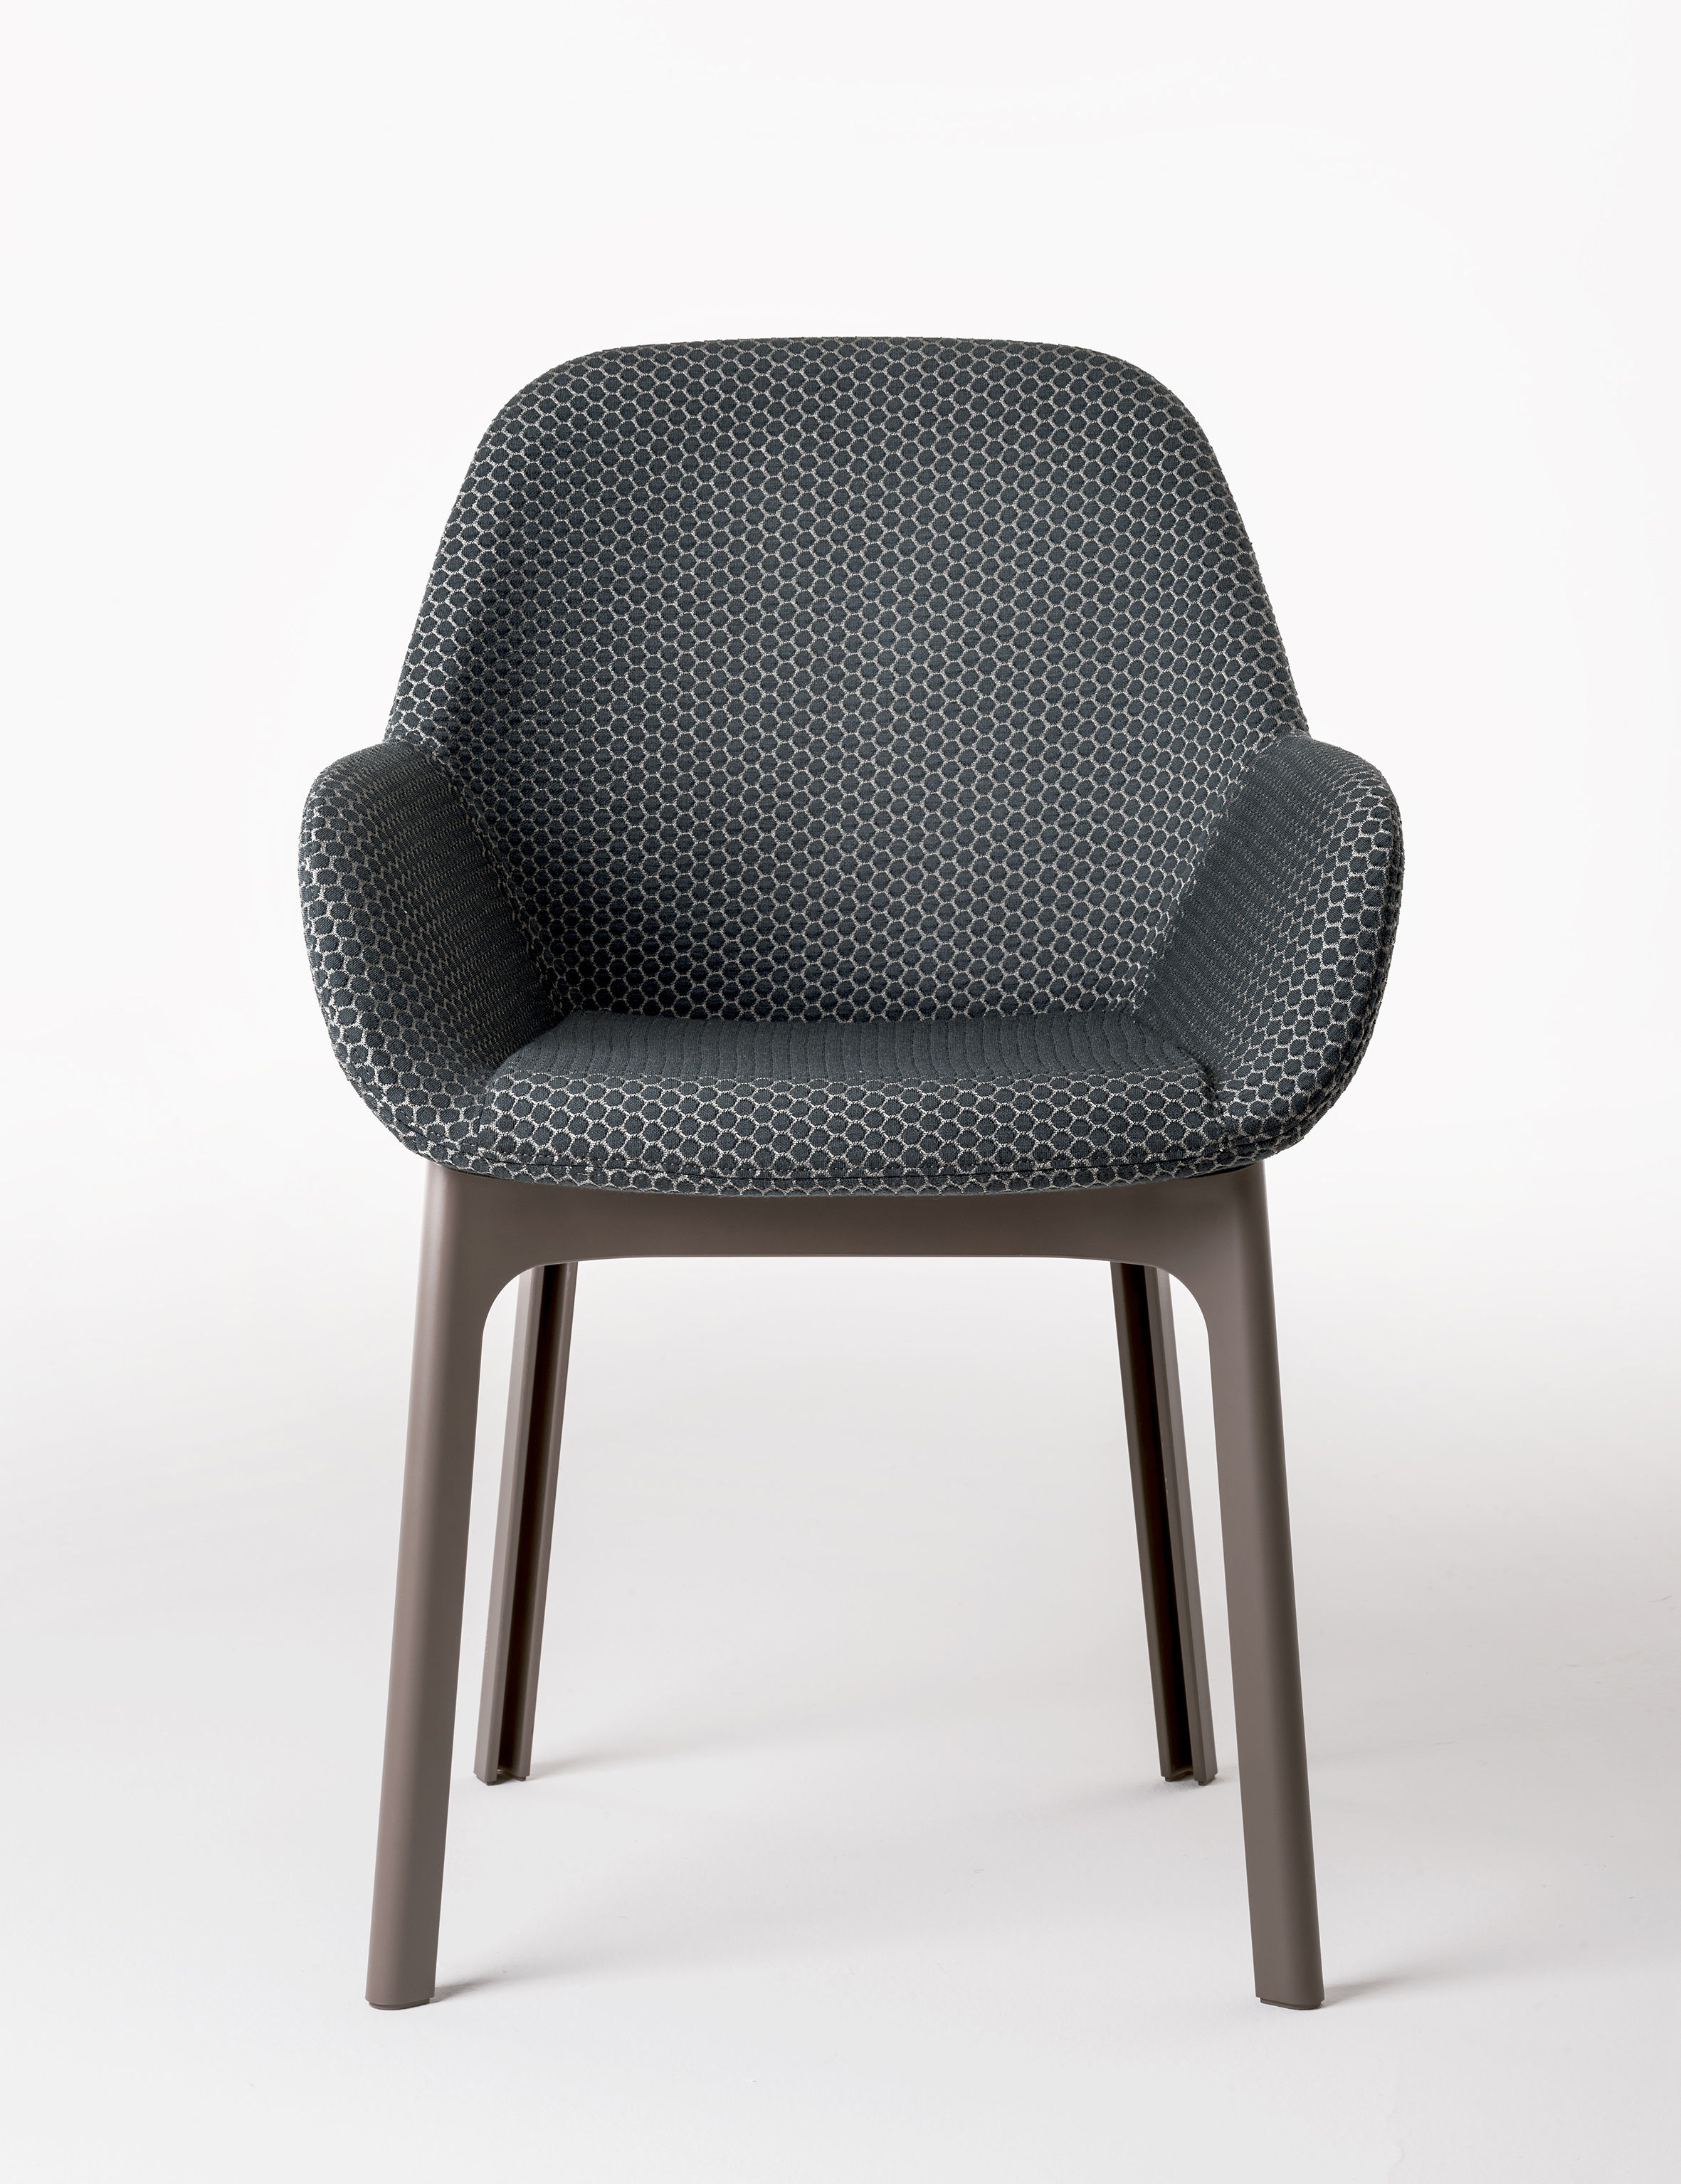 fauteuil rembourr clap kartell noir beige made in design. Black Bedroom Furniture Sets. Home Design Ideas